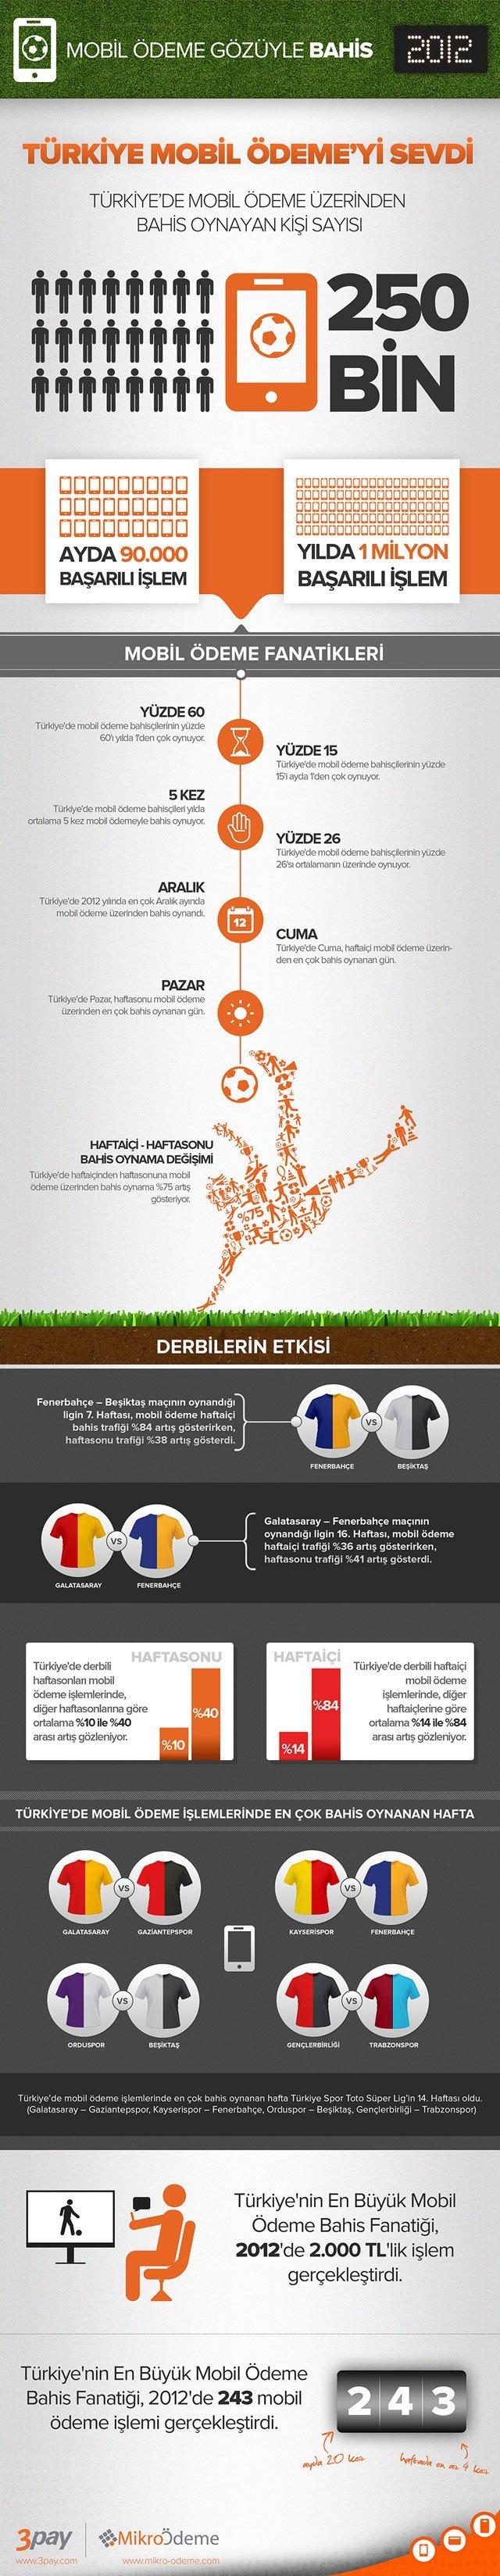 3pay-Infografik-27022013-640-webrazzi